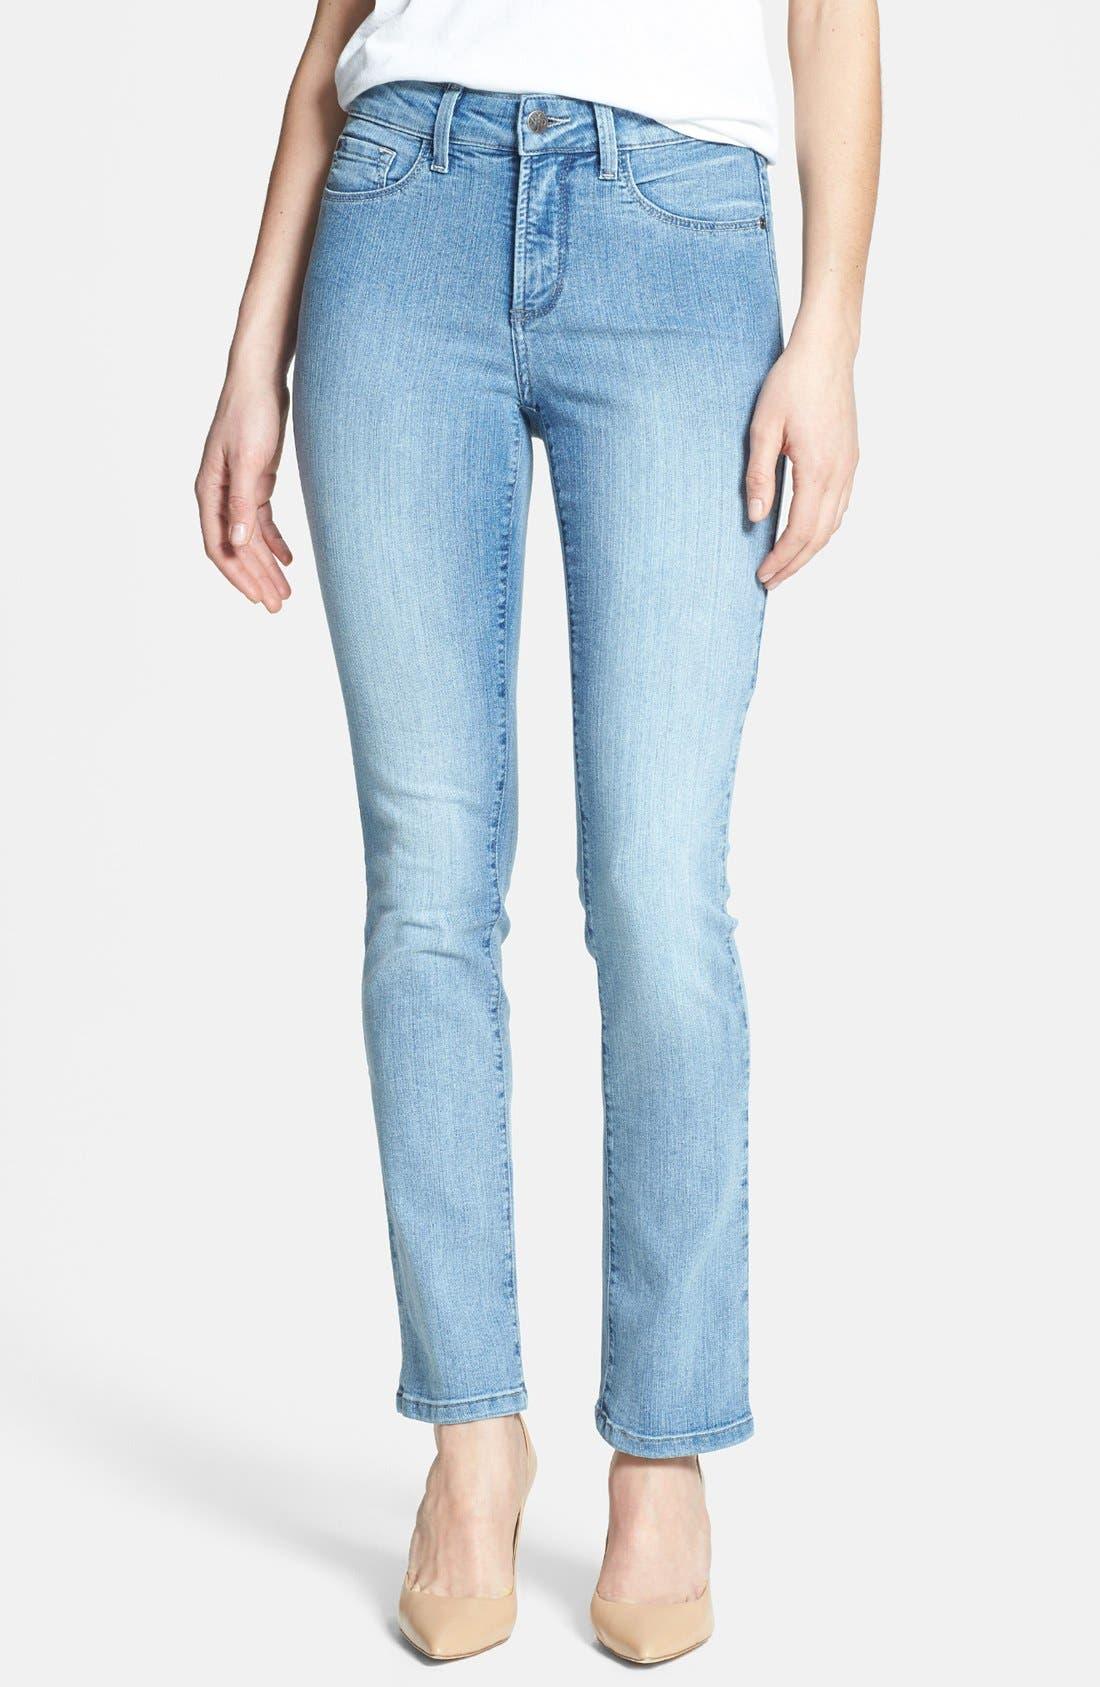 Main Image - NYDJ 'Sheri' Stretch Skinny Jeans (Palos Verdes) (Regular & Petite)